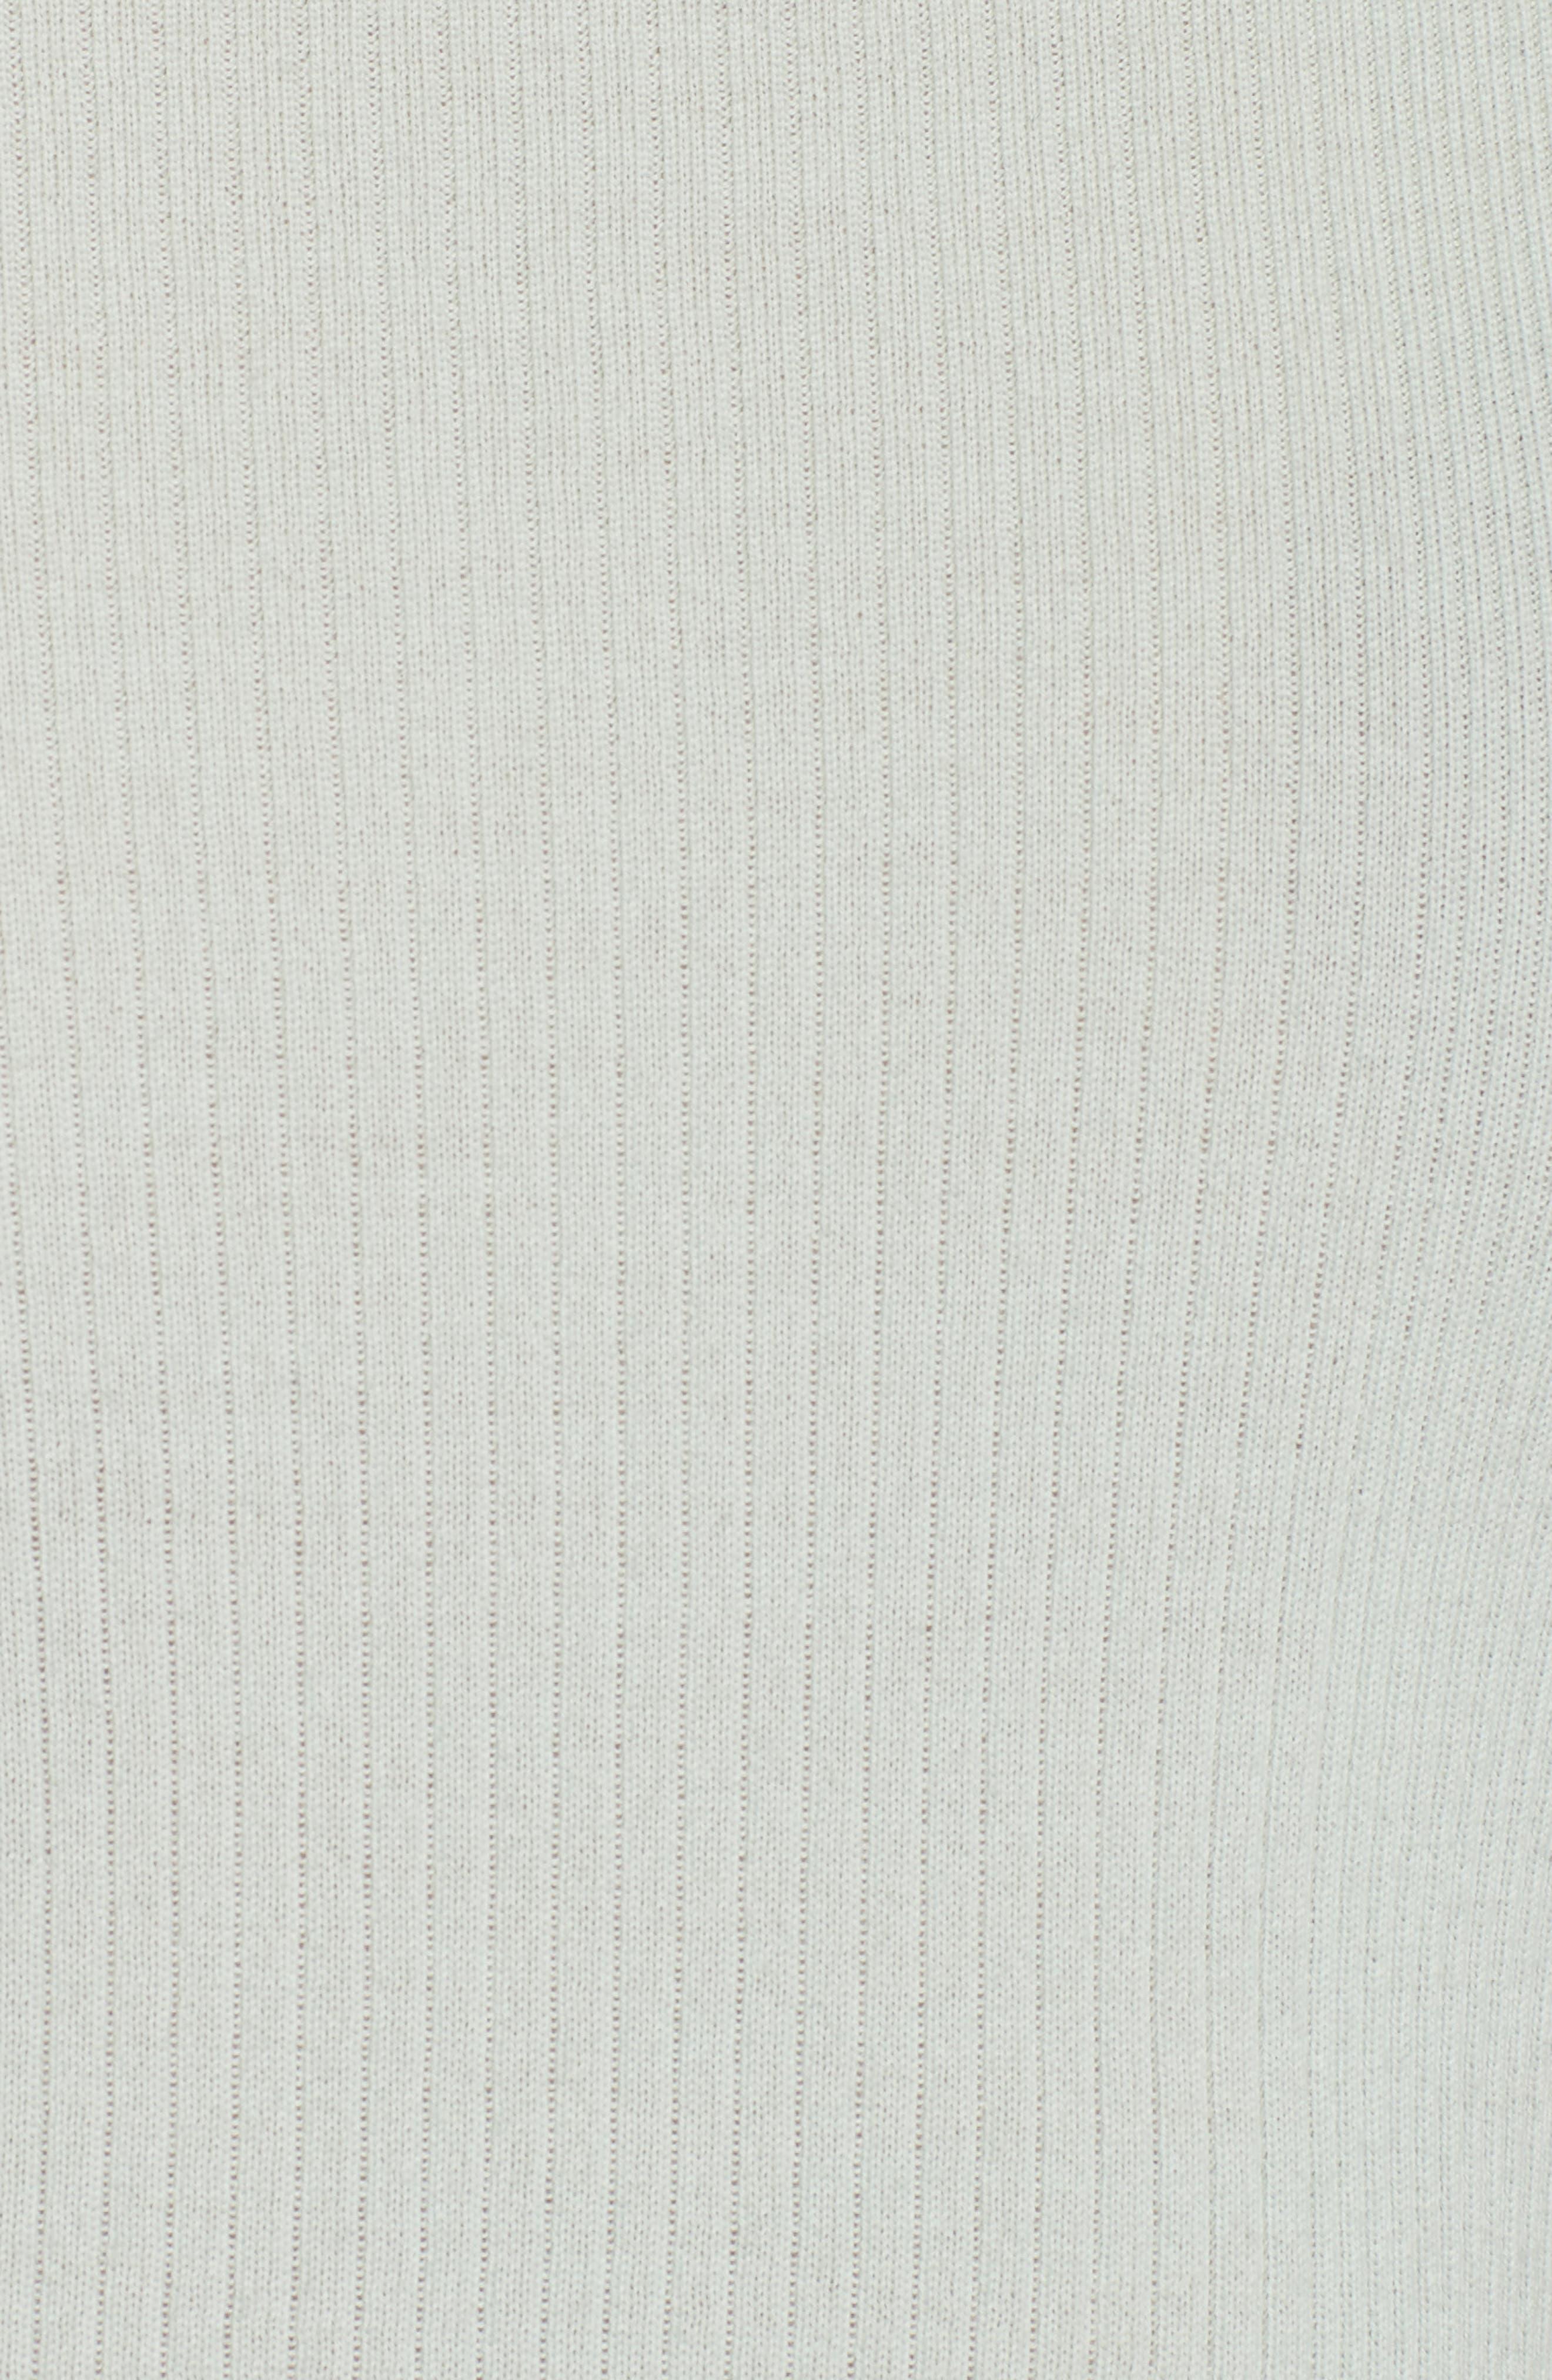 Merino Wool Blend Sweater,                             Alternate thumbnail 14, color,